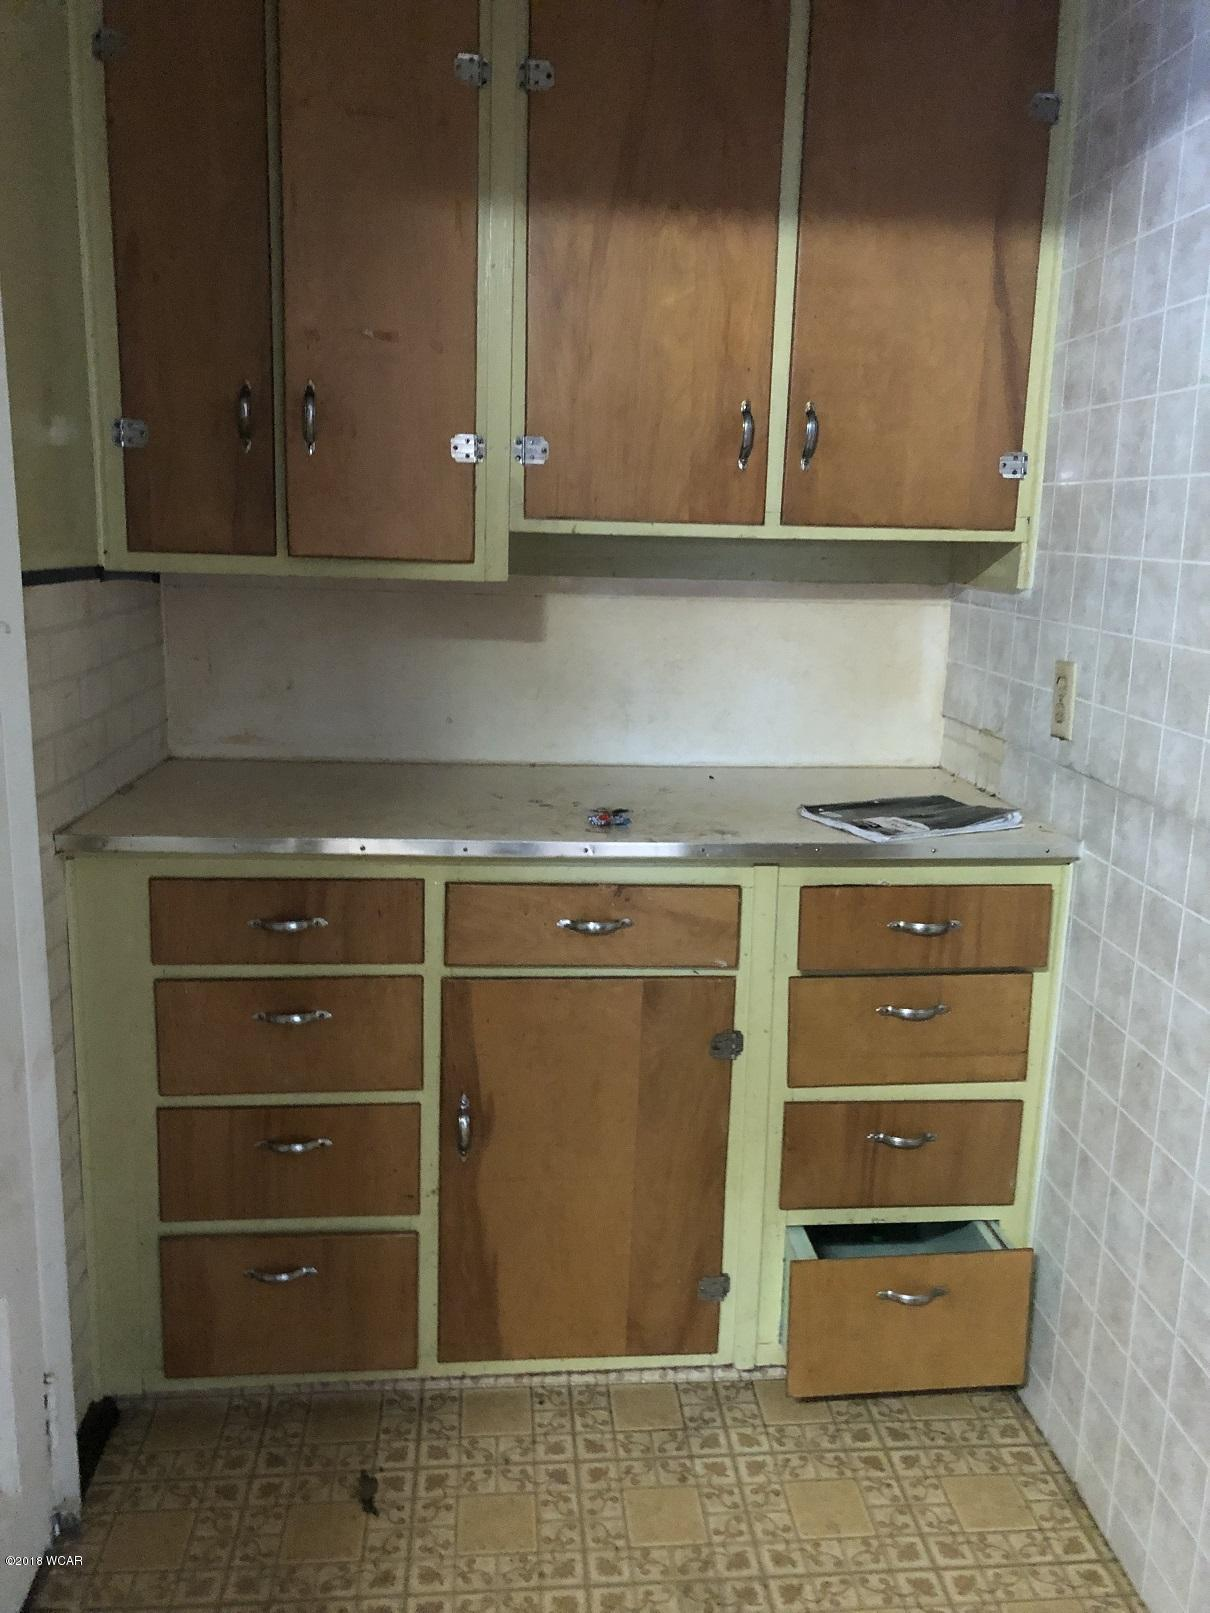 227 S Haven,Appleton,3 Bedrooms Bedrooms,1 BathroomBathrooms,Single Family,S Haven,6033149